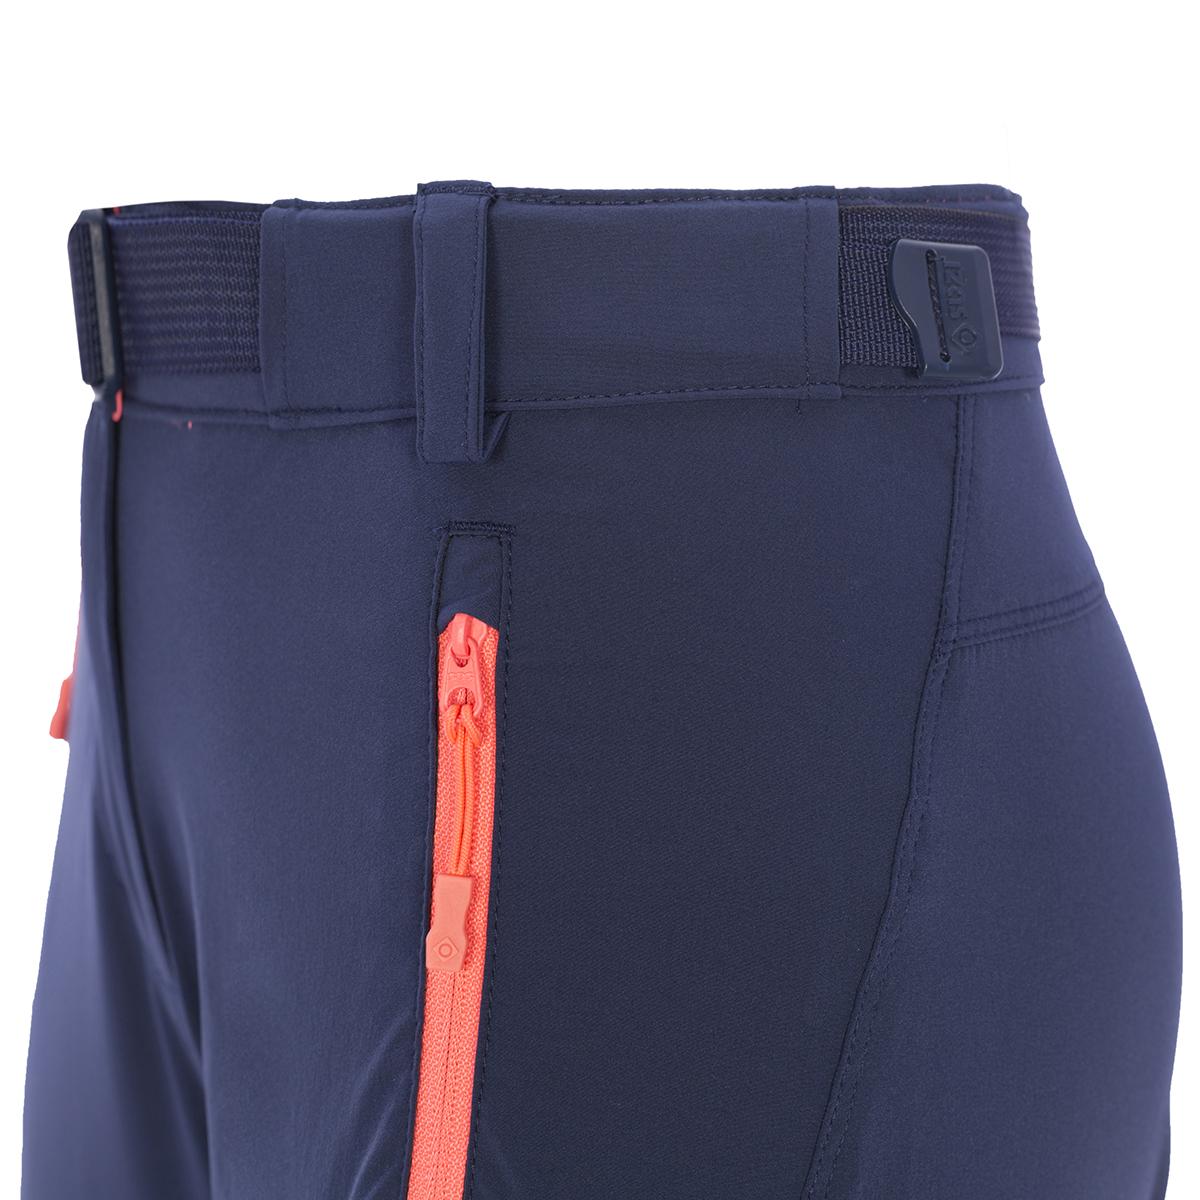 WOMAN'S FORATA MOUNT STRETCH PANT BLUE